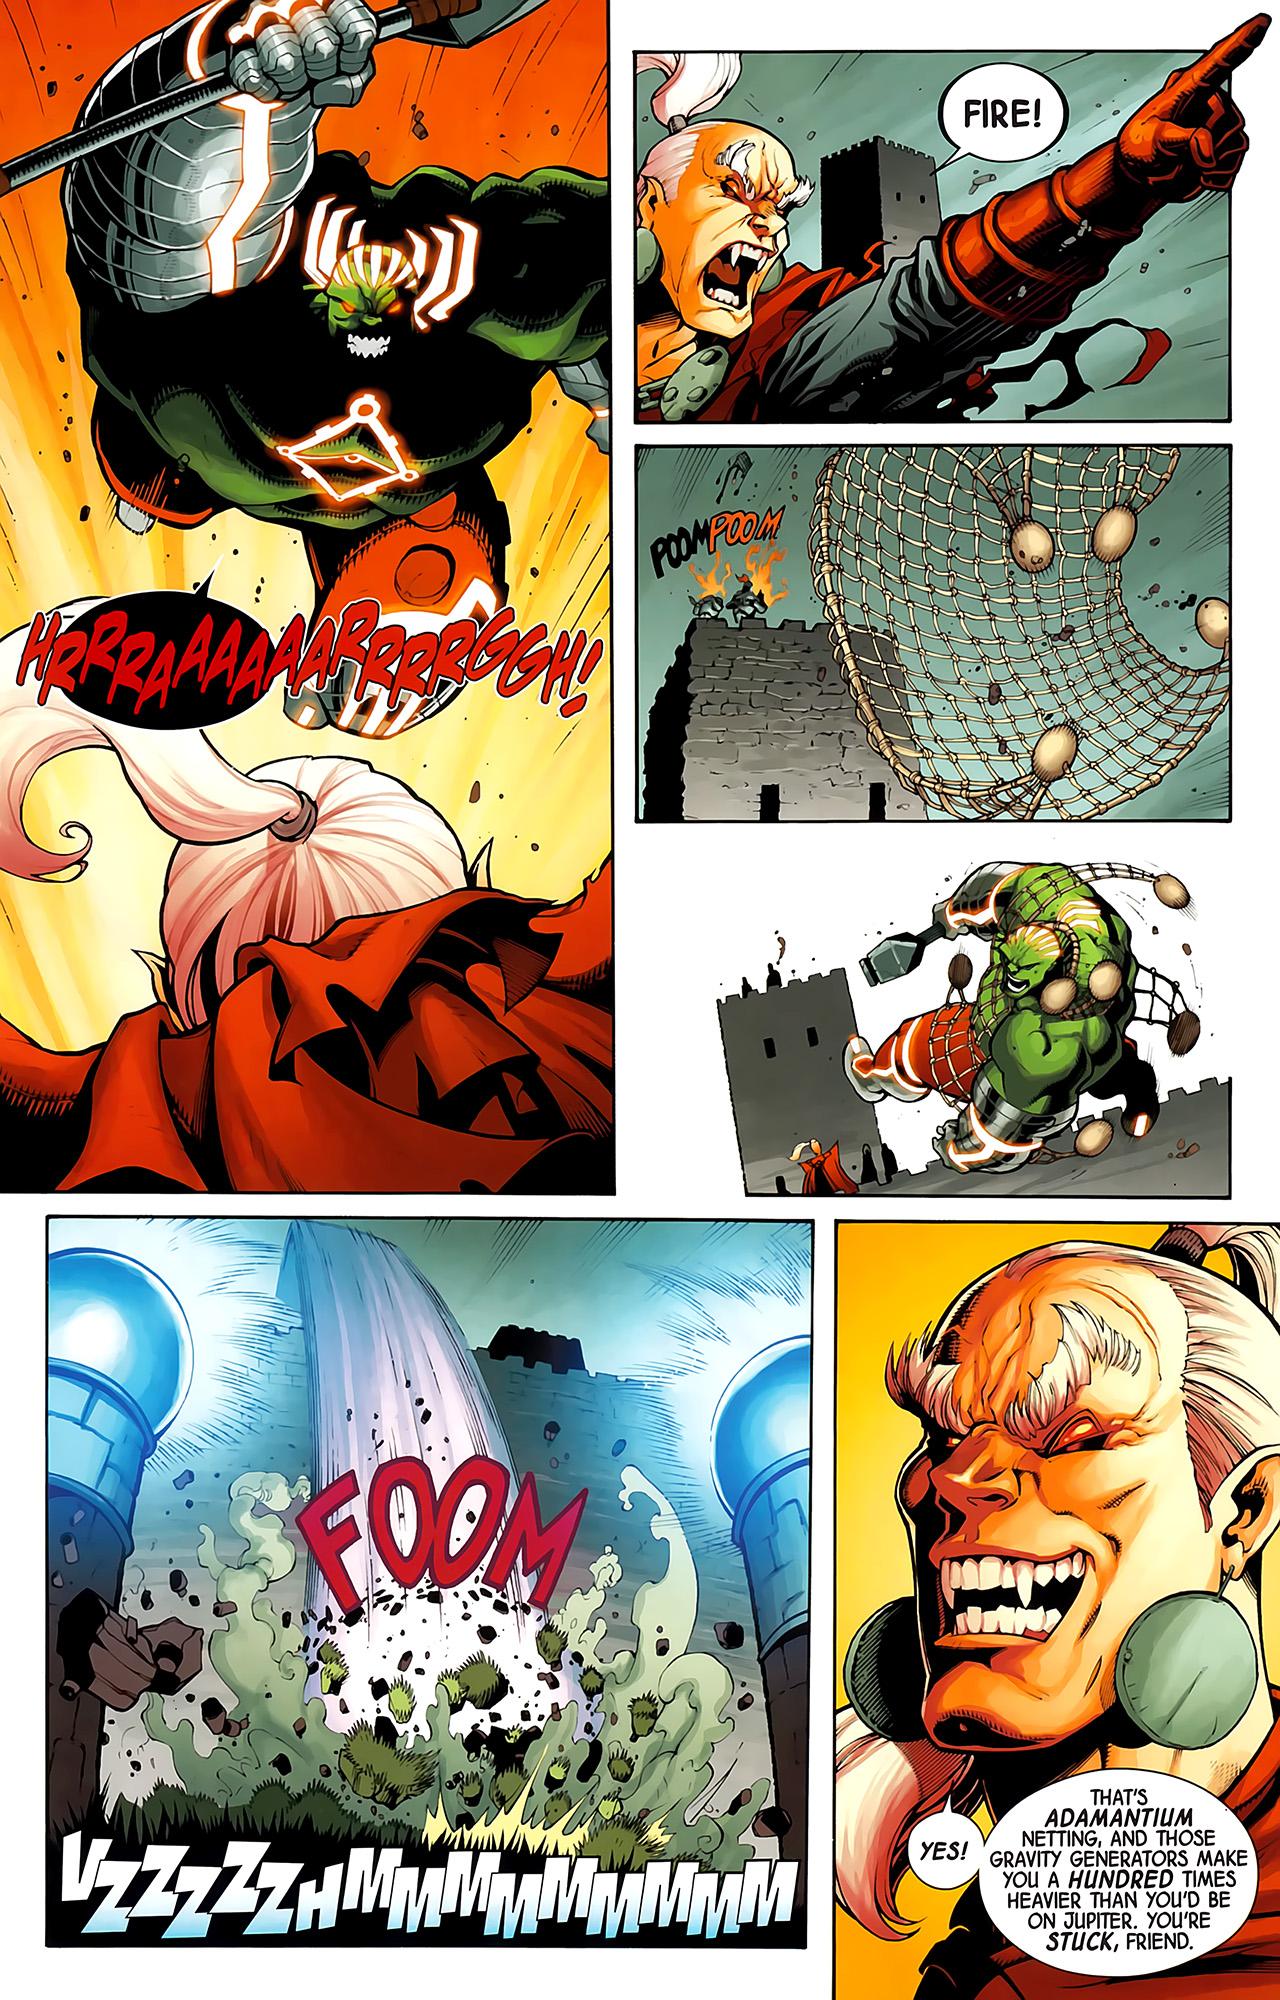 Fear Itself Hulk vs Dracula Issue 3 | Viewcomic reading comics online for free 2019